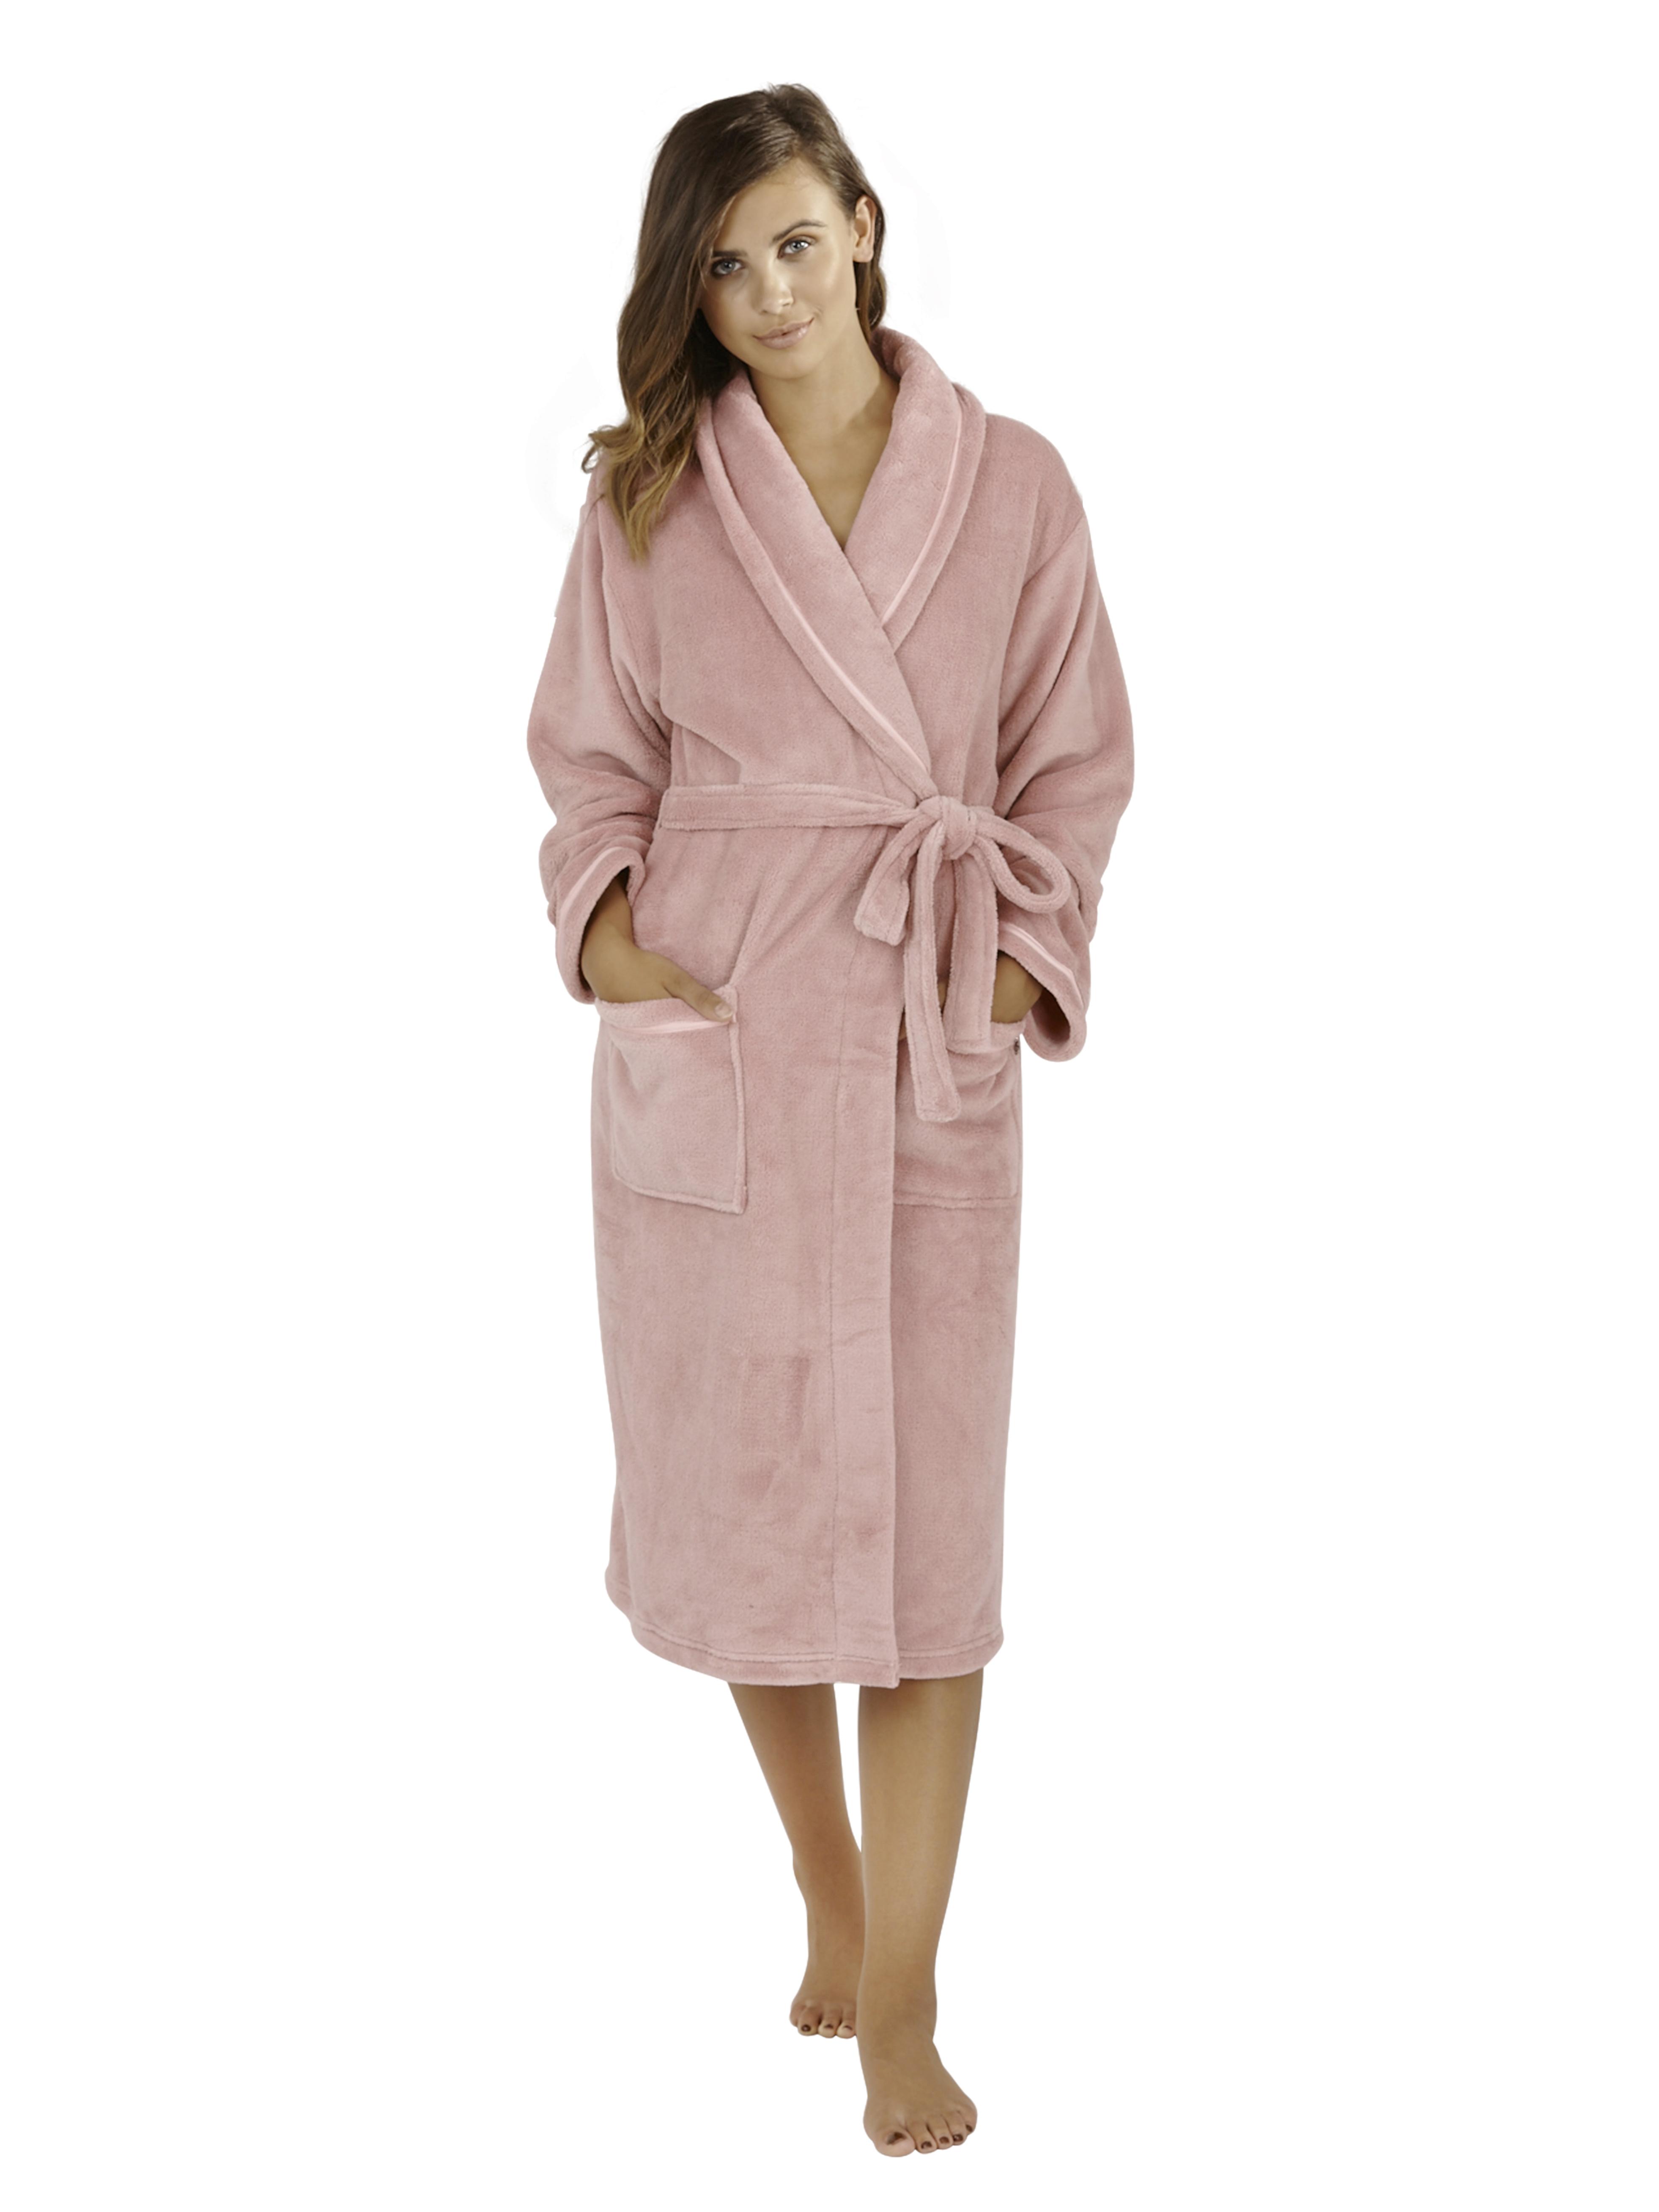 womens full length fleece bath robe dressing gown. Black Bedroom Furniture Sets. Home Design Ideas